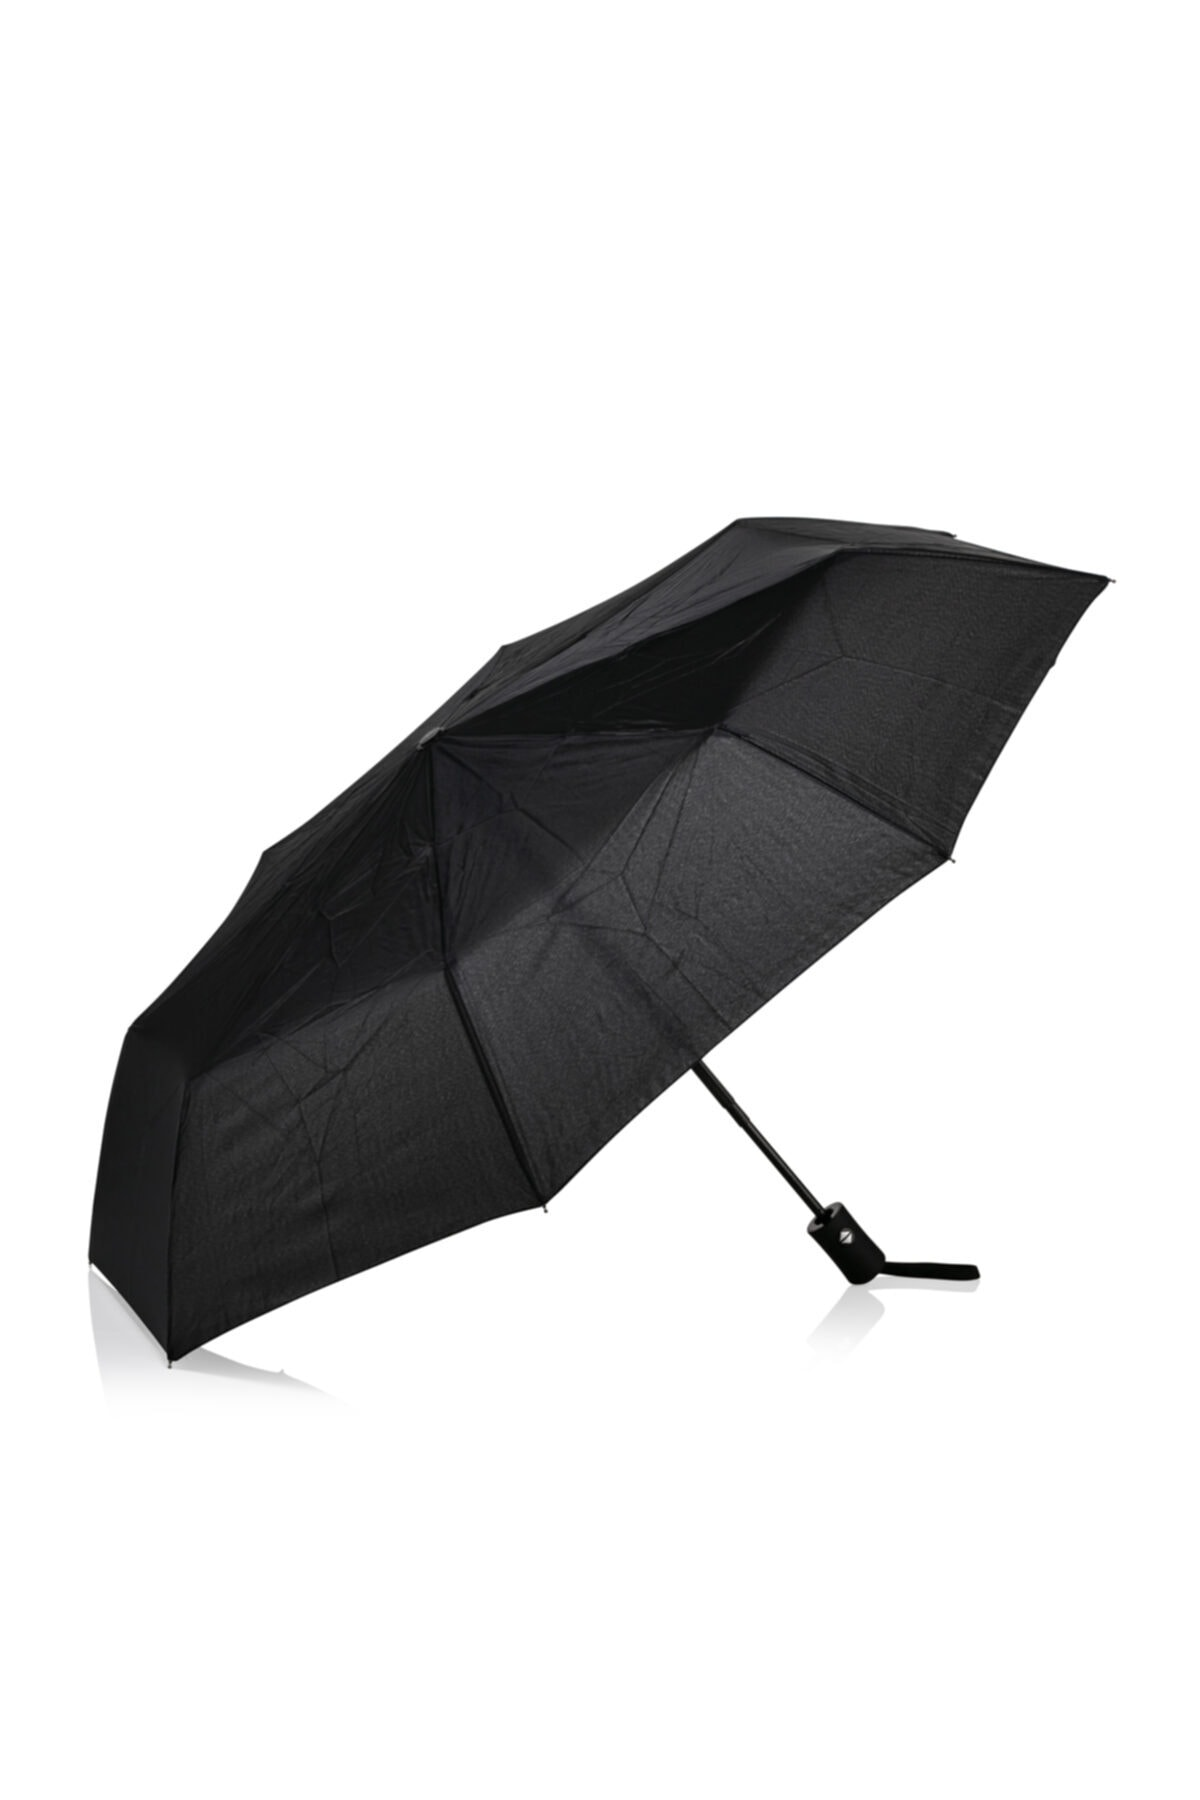 Noom Art Siyah Tam Otomatik Şemsiye 2